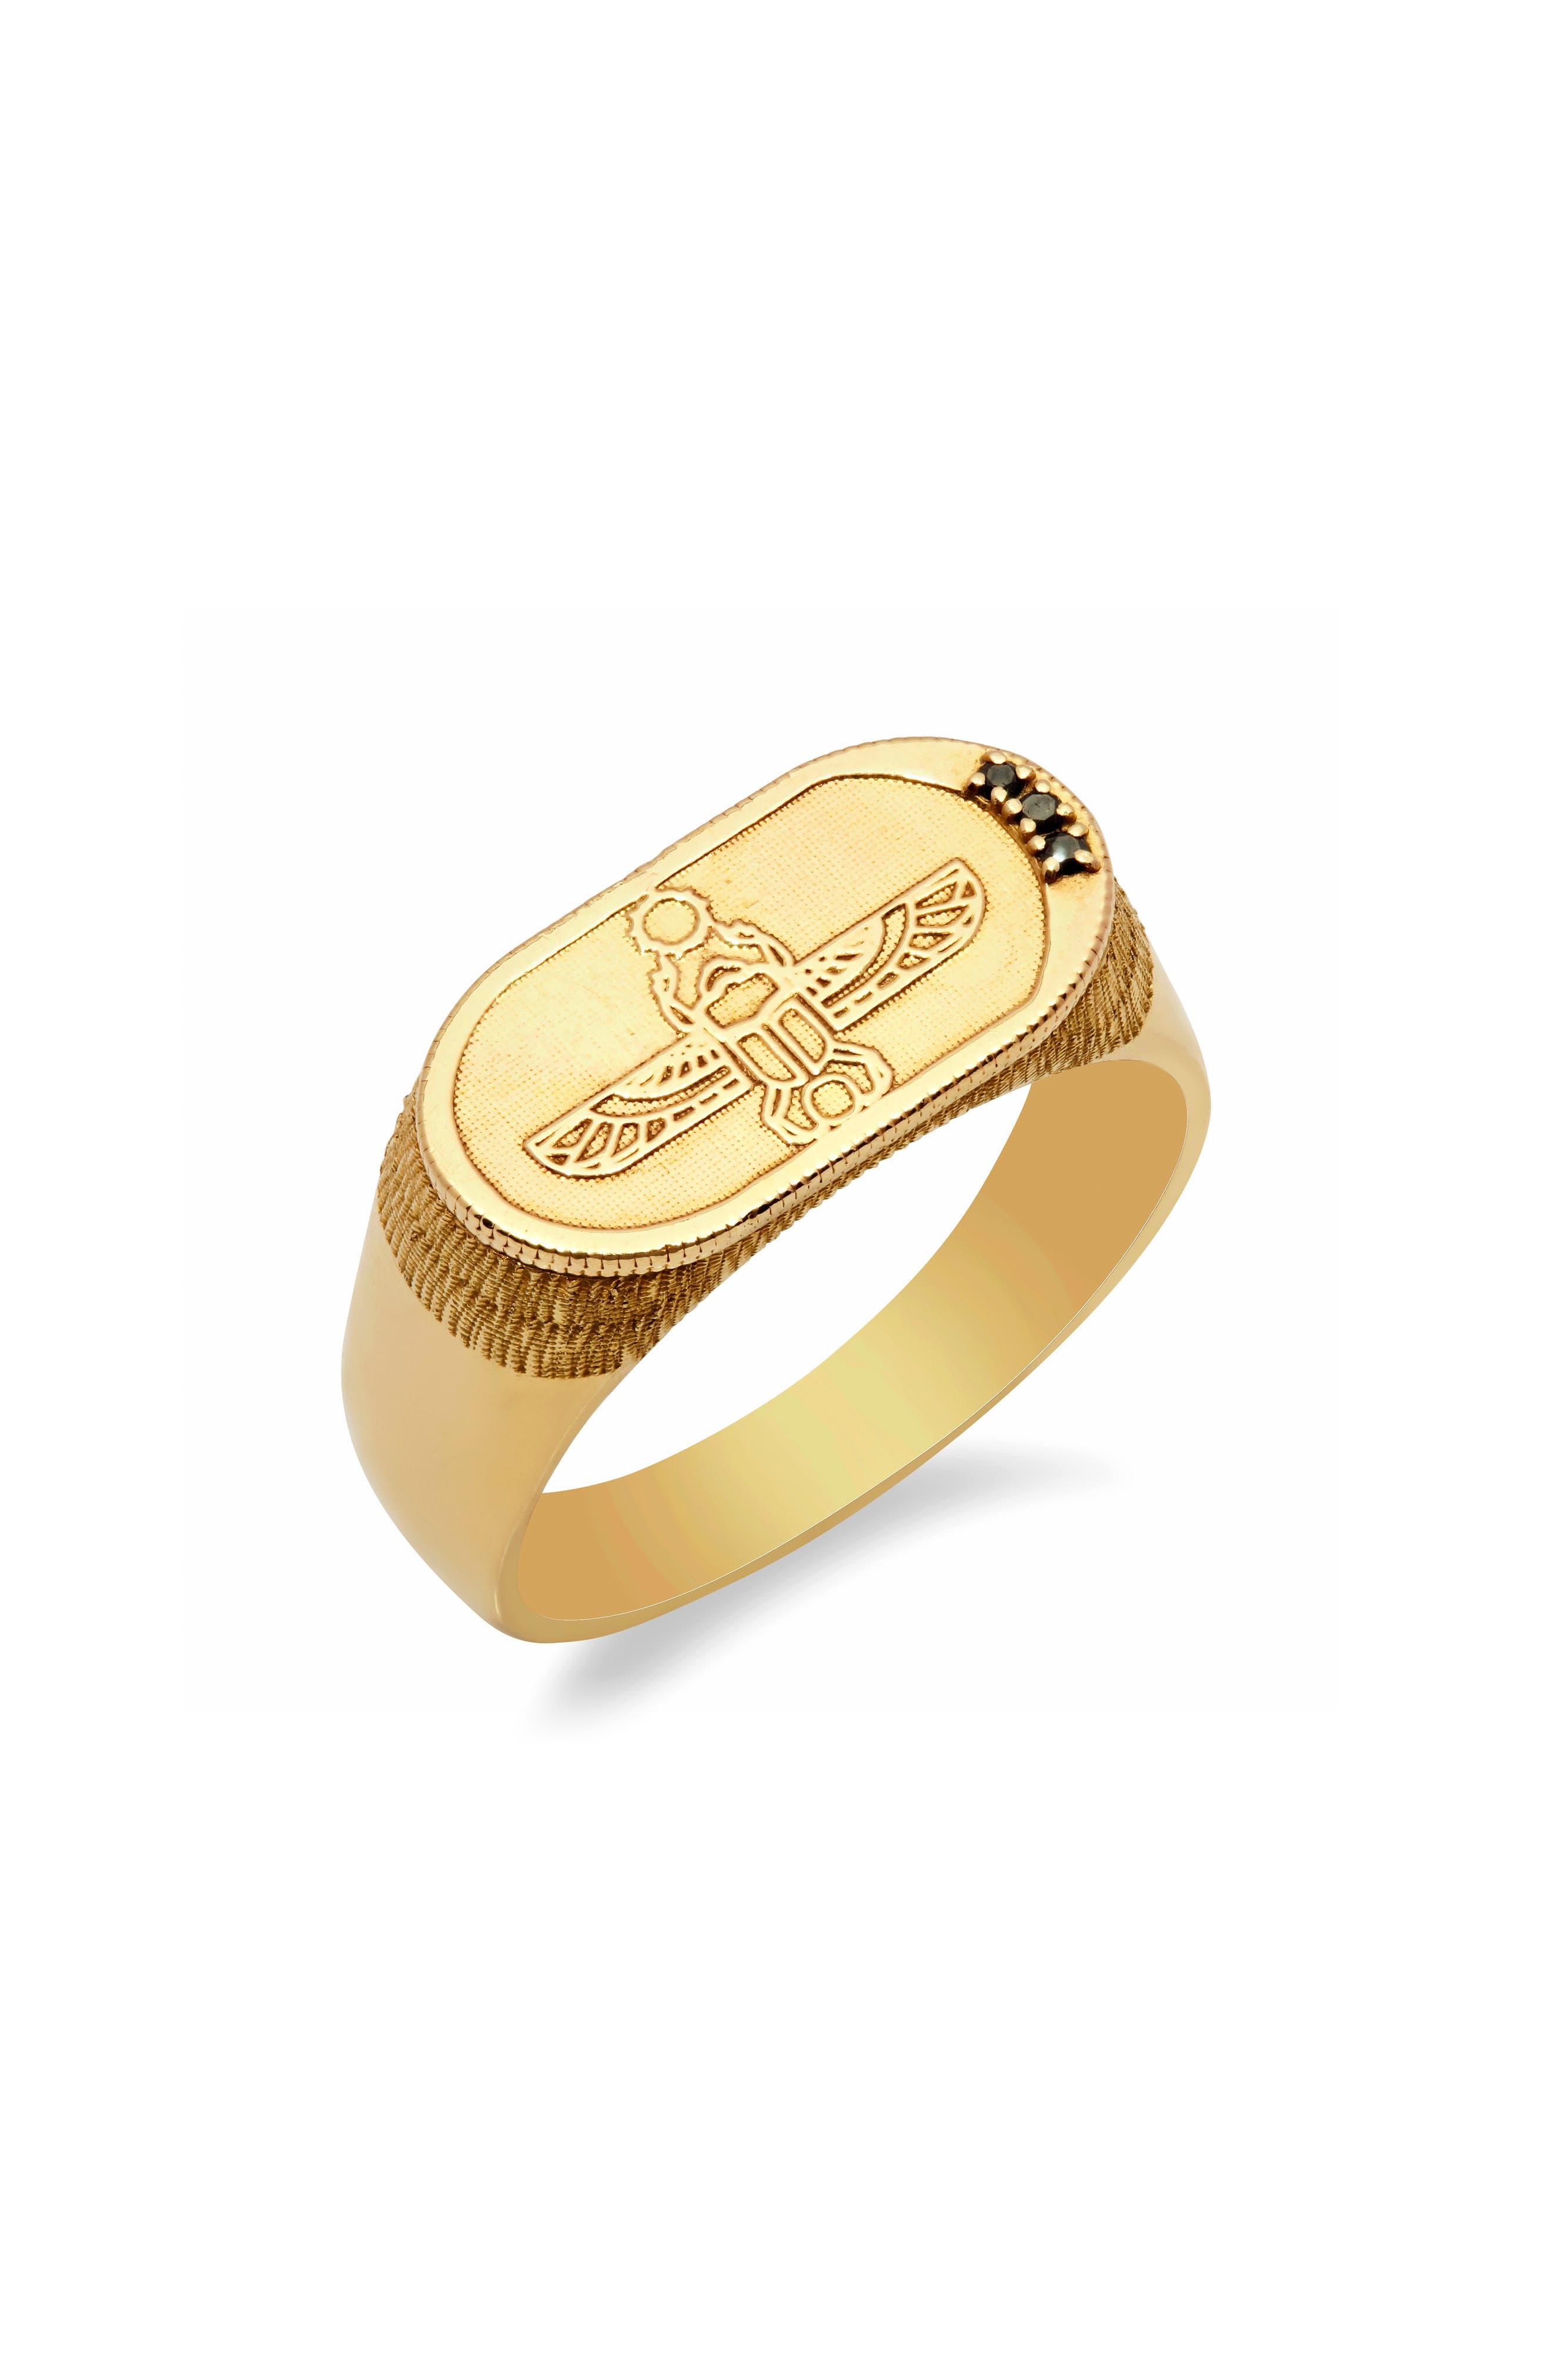 Congés Old School Black Diamond Scarab Ring,                         Main,                         color, YELLOW GOLD